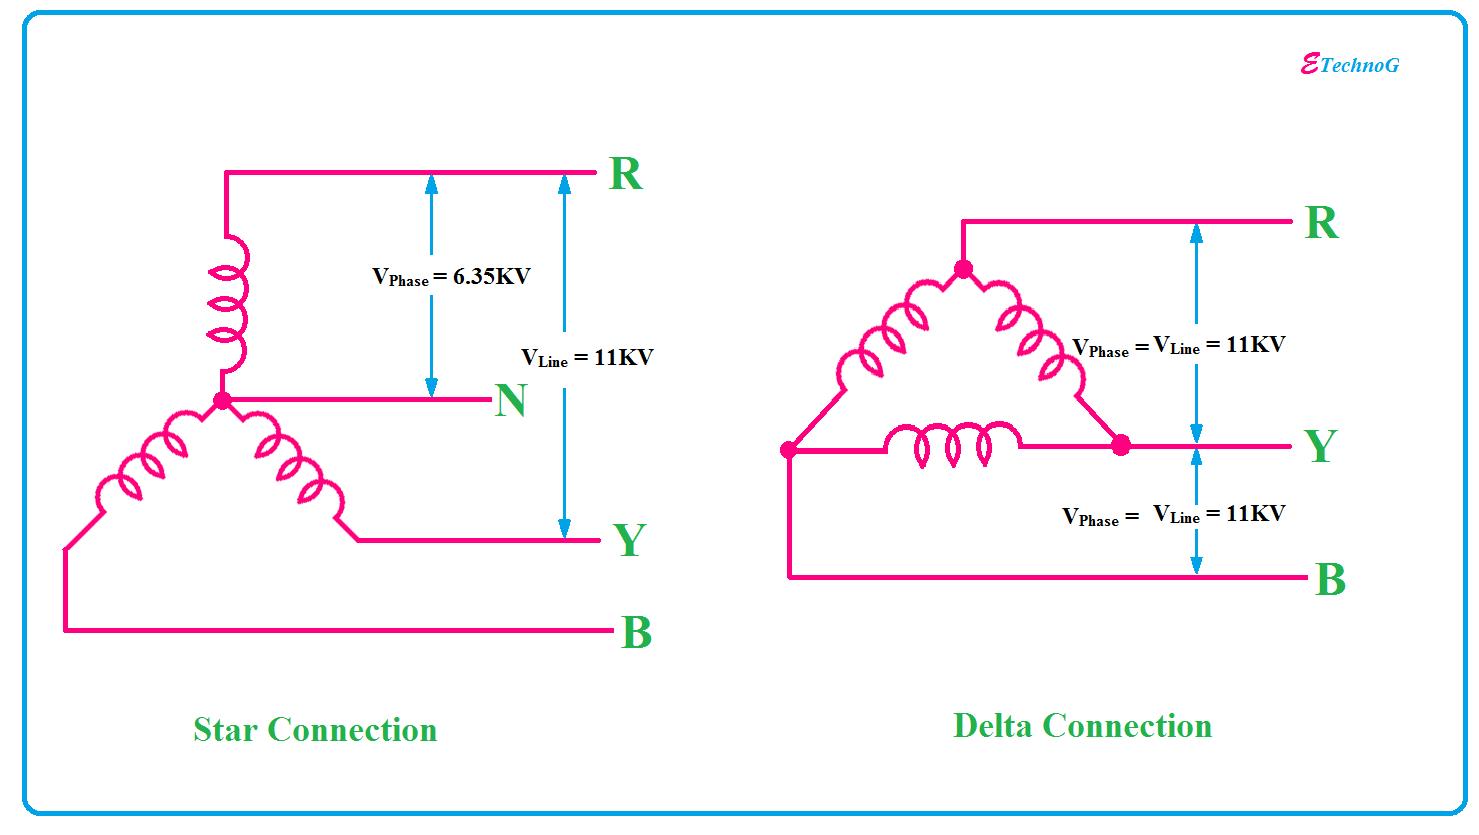 medium resolution of why alternator armature winding always connected in star etechnog alternator stator winding diagram alternator winding diagram